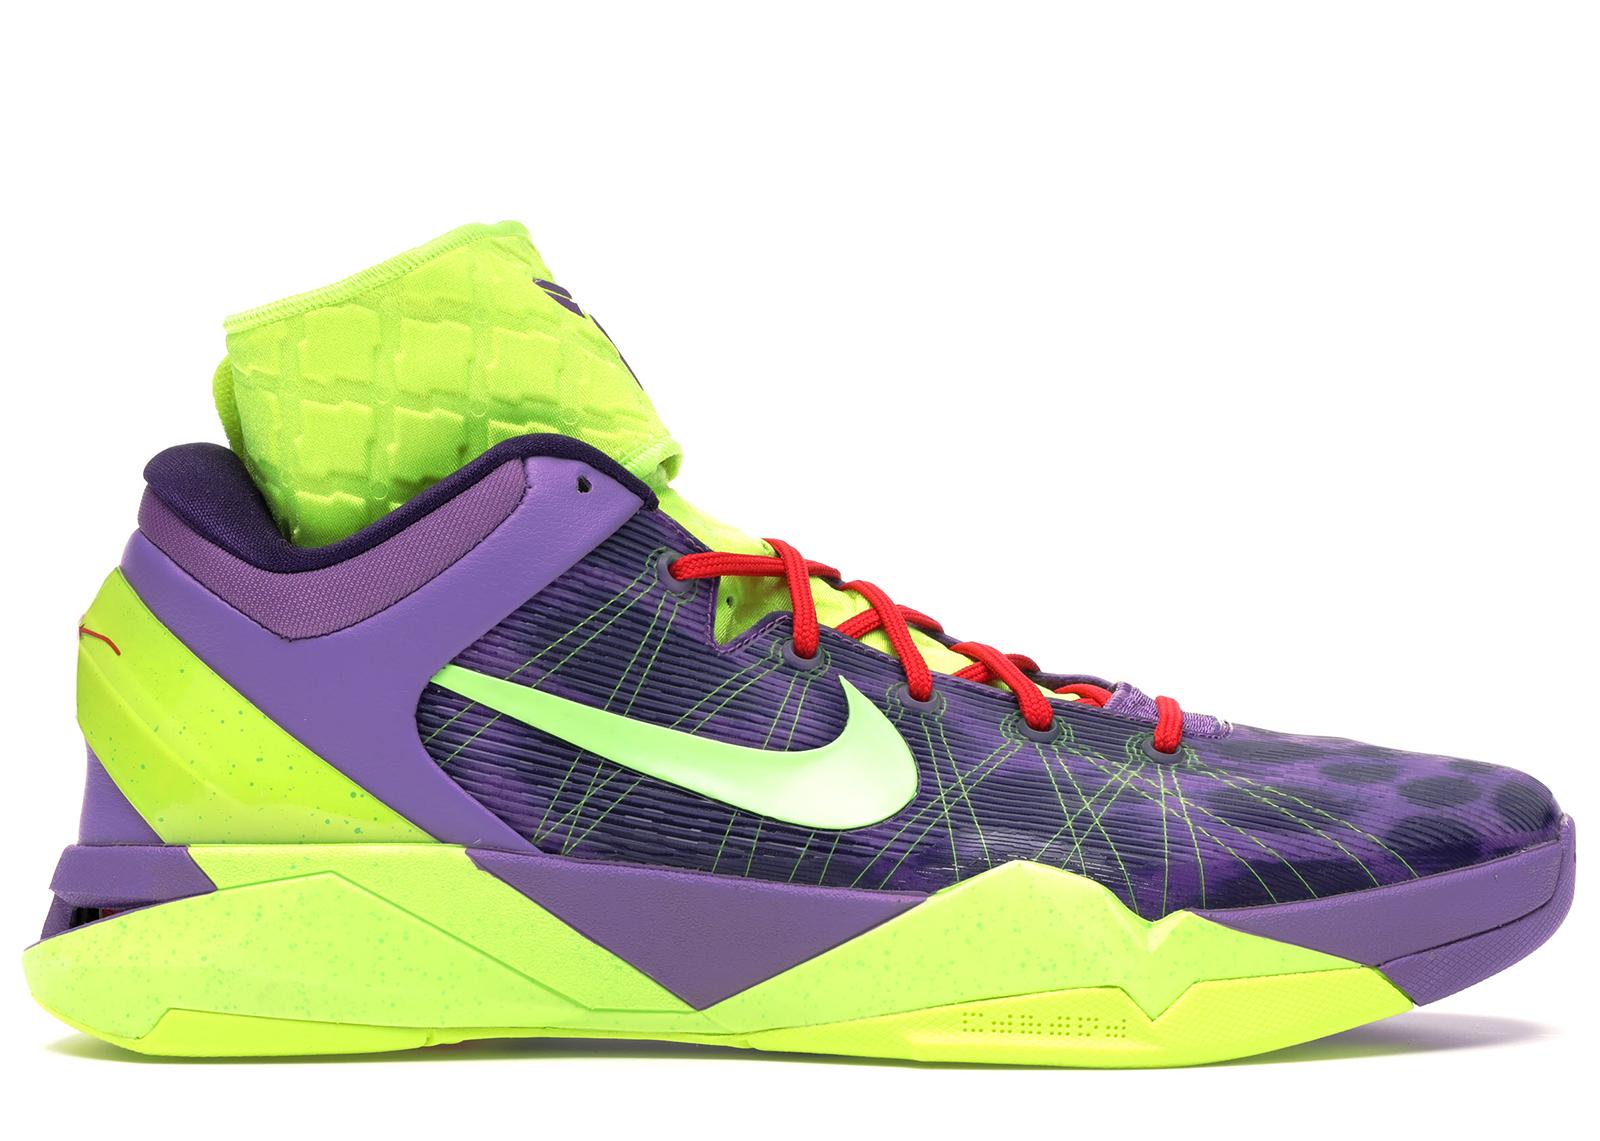 Nike Kobe 7 Christmas (Leopard) - 488244-500